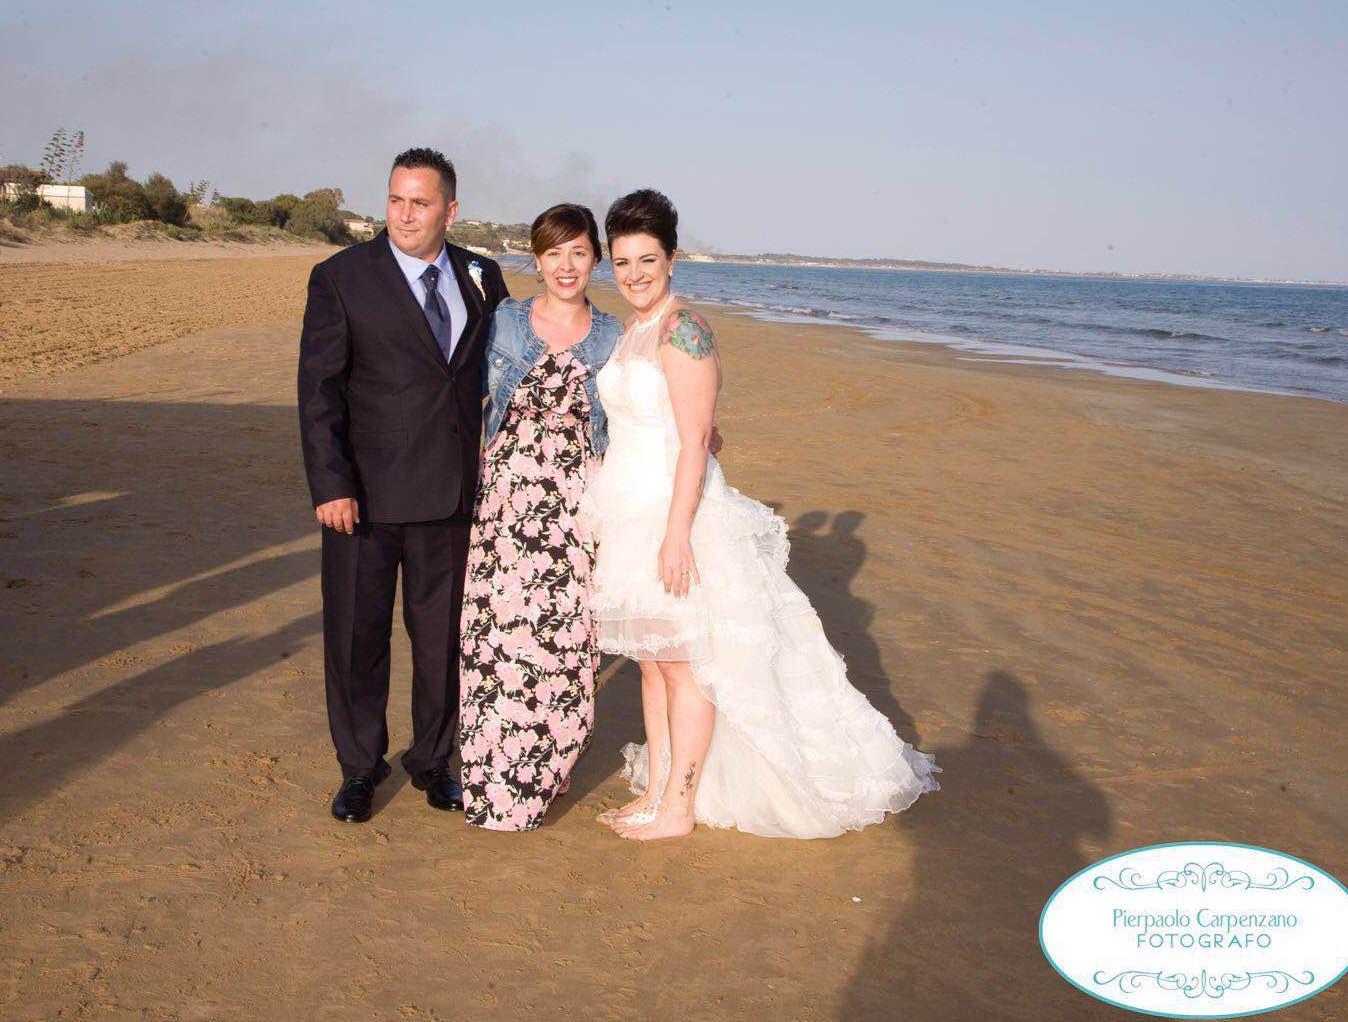 Matrimonio Spiaggia Uomo : Matrimonio in spiaggia a pozzallo